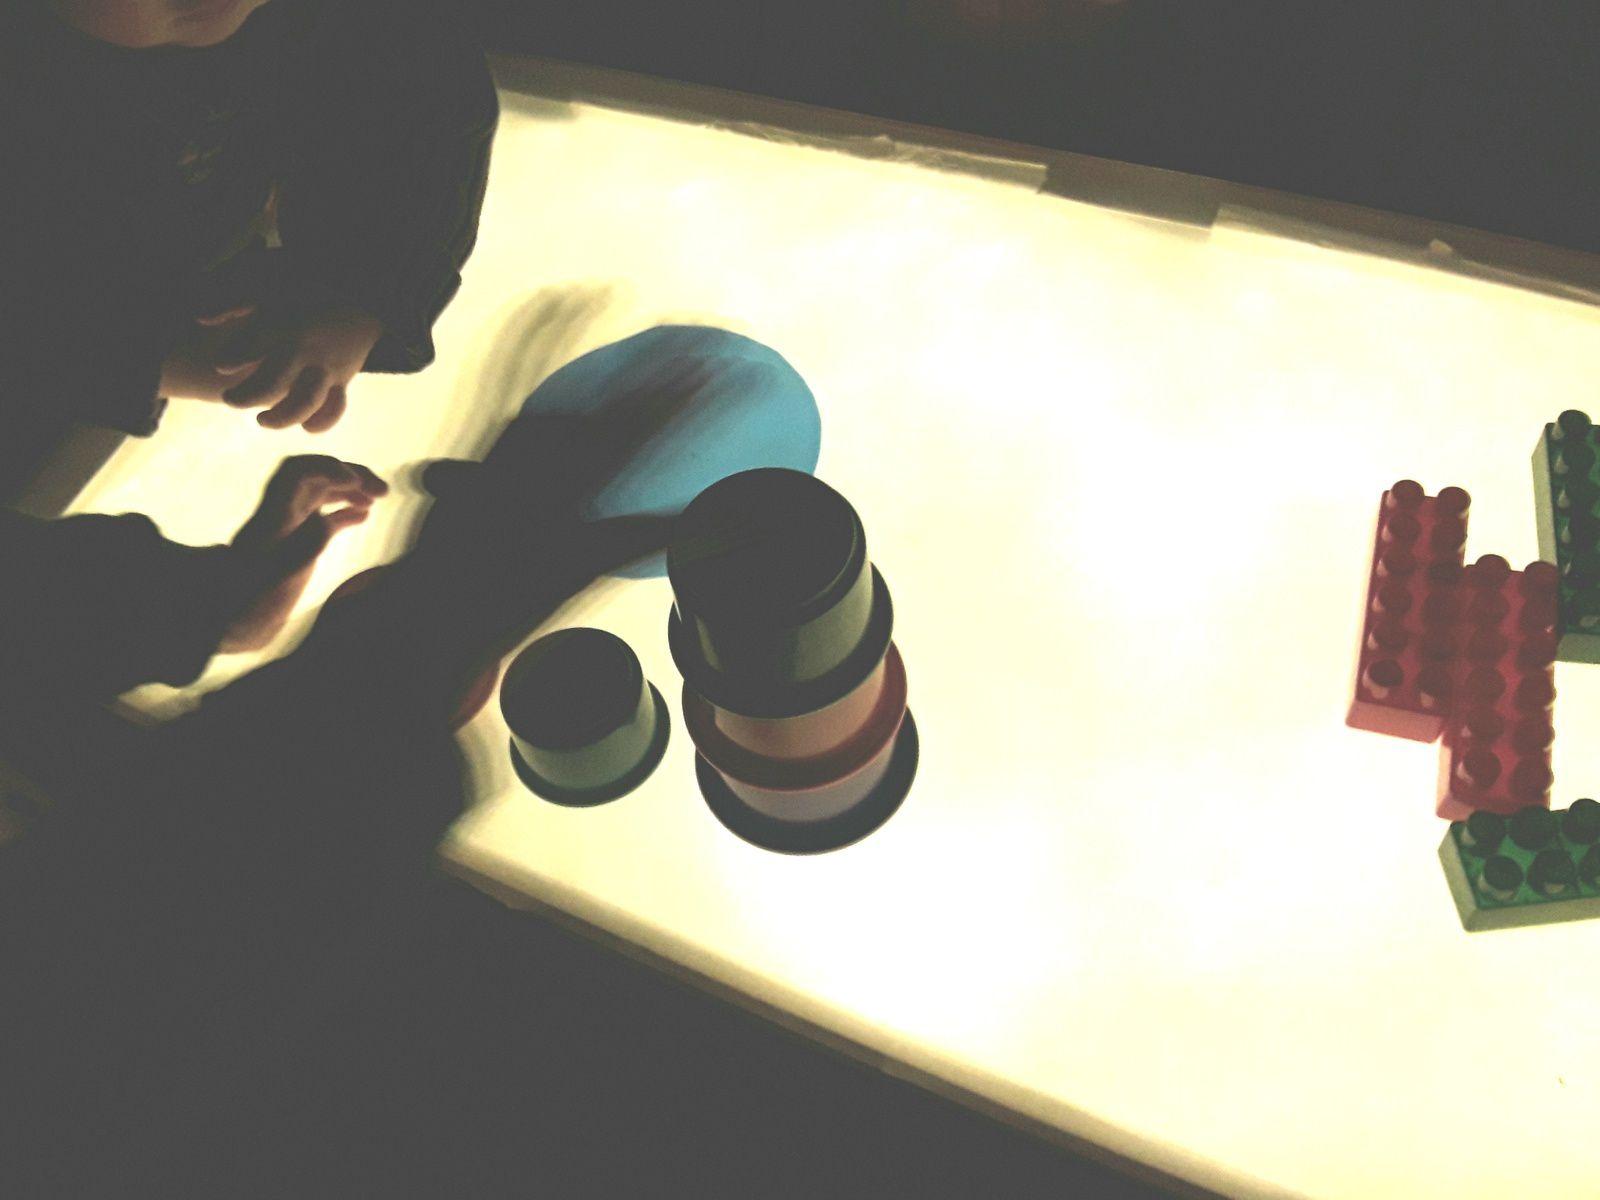 Jeux avec la table lumineuse 💡